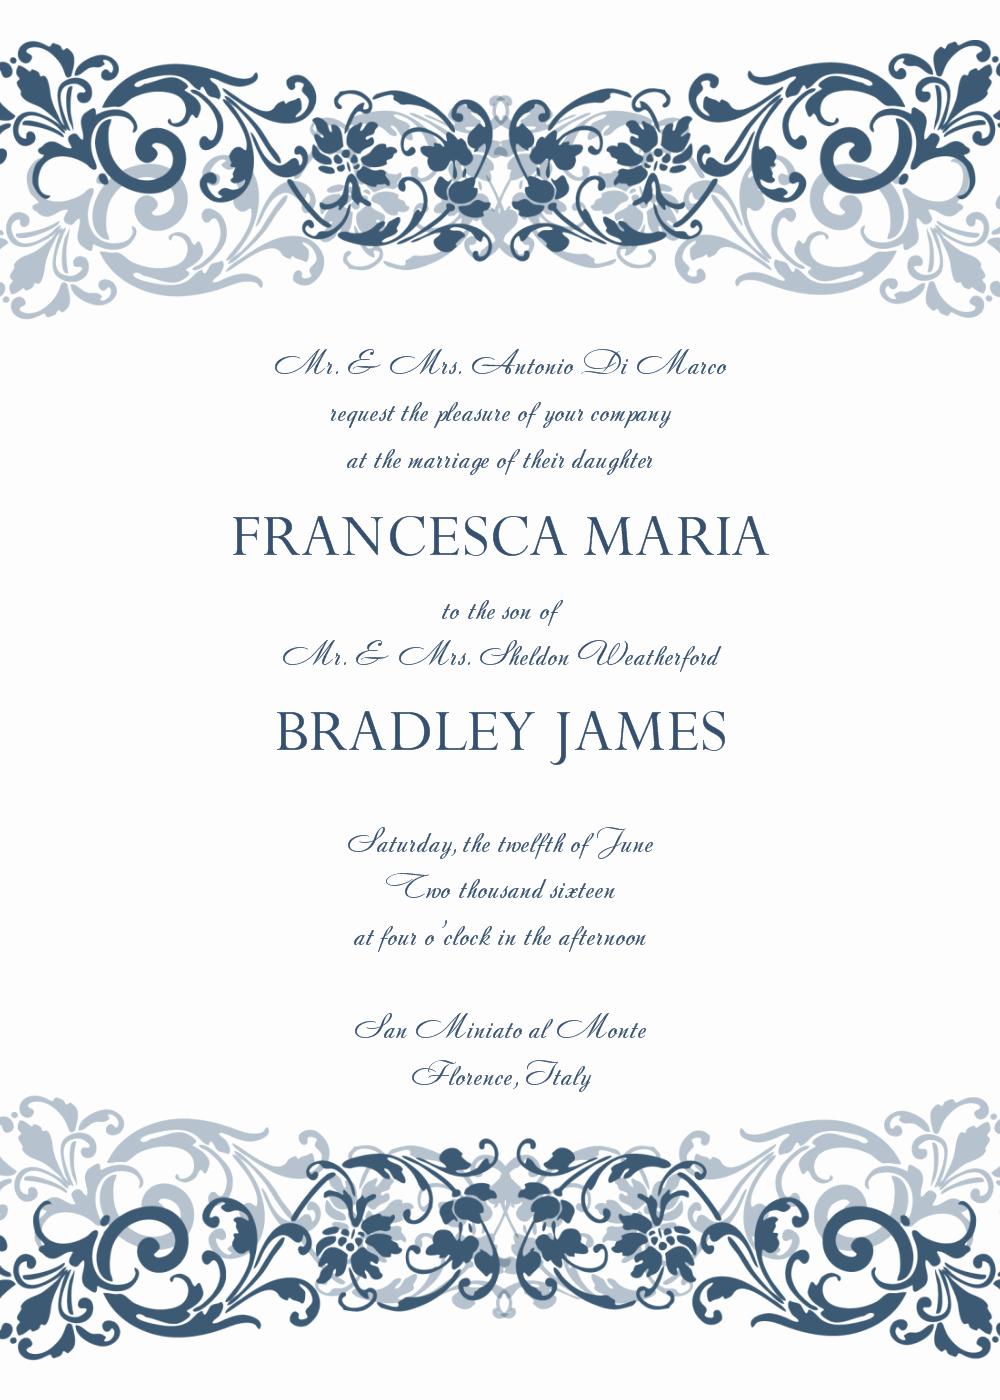 Free Wedding Invitation Printable Templates Best Of 8 Free Wedding Invitation Templates Excel Pdf formats